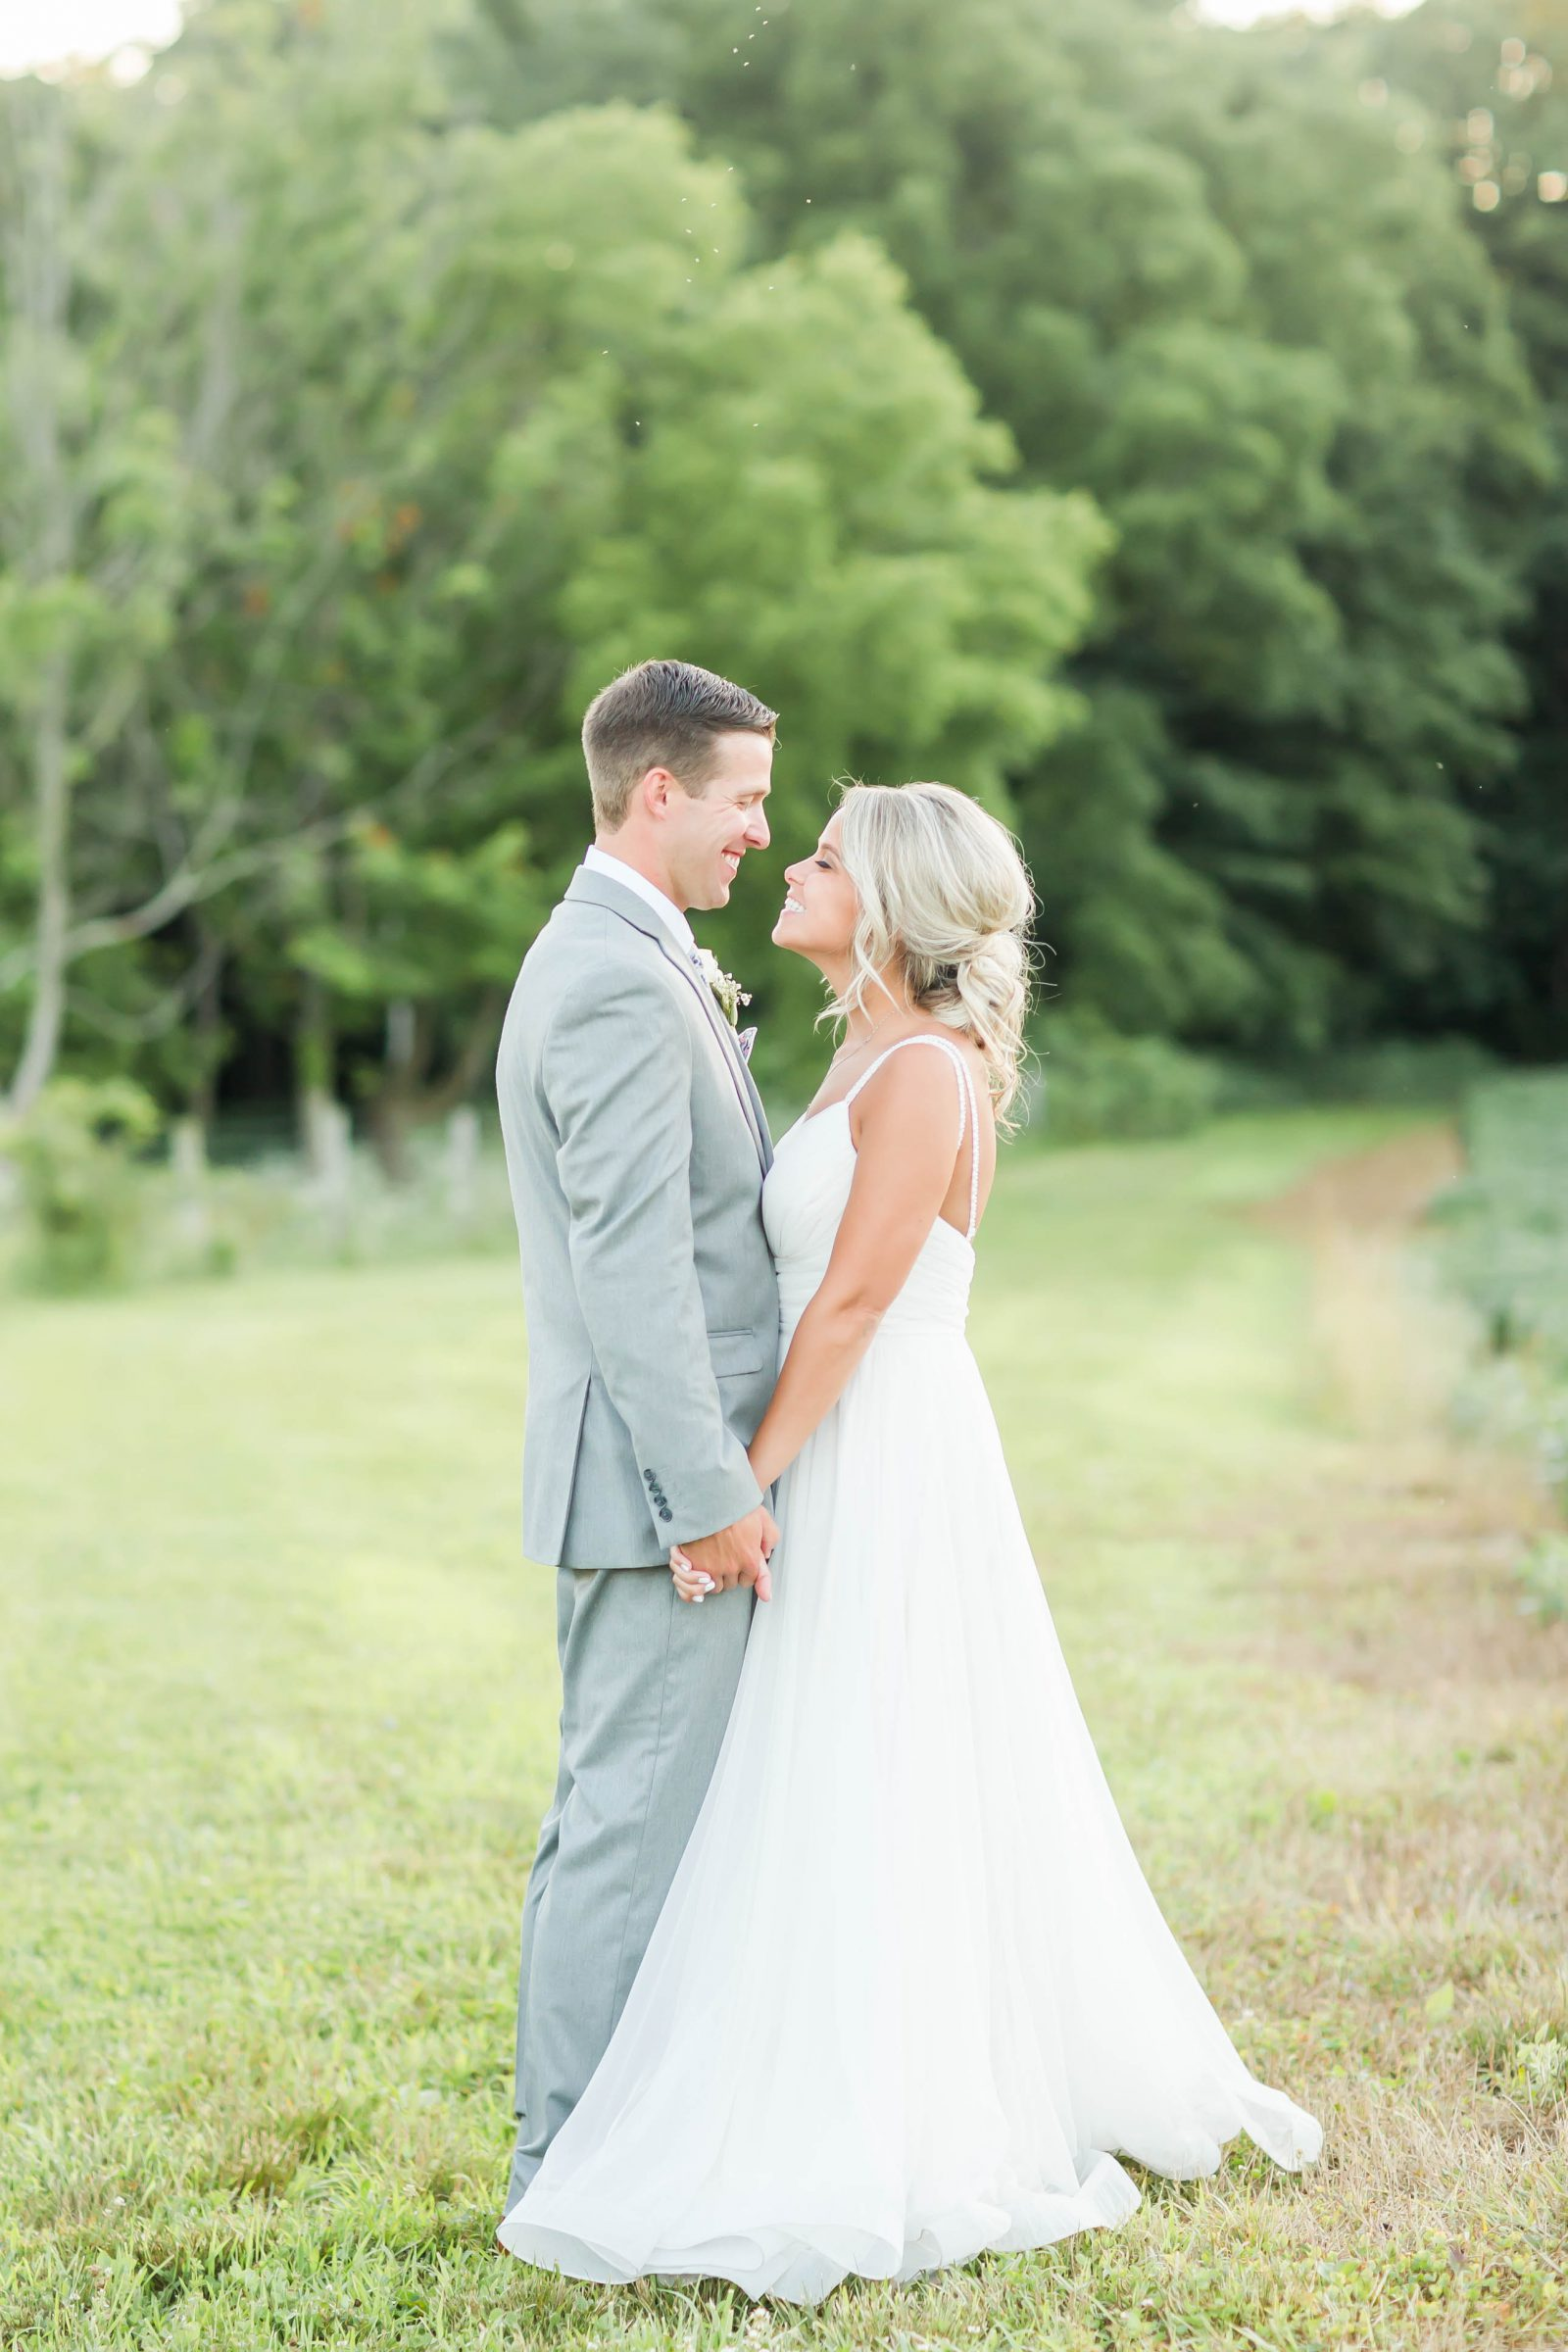 peacock-ridge-summer-wedding-photographer-akron-ohio-loren-jackson-photography-121